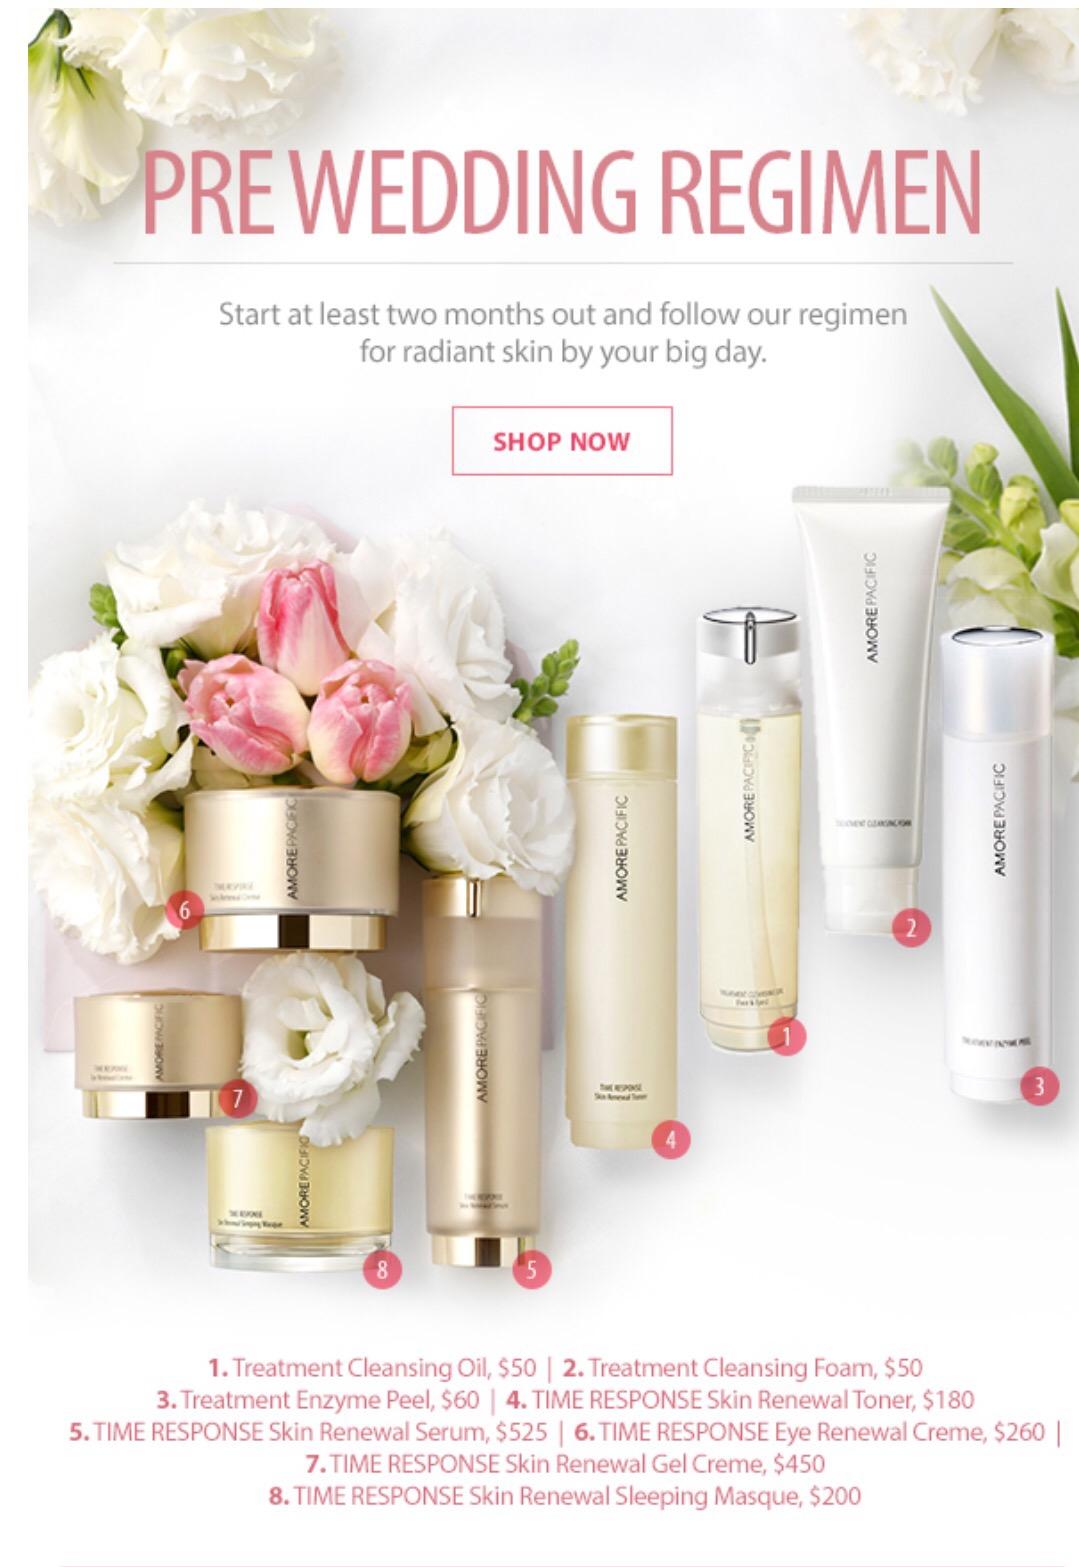 Bridal Beauty Prep w/ AmorePacific